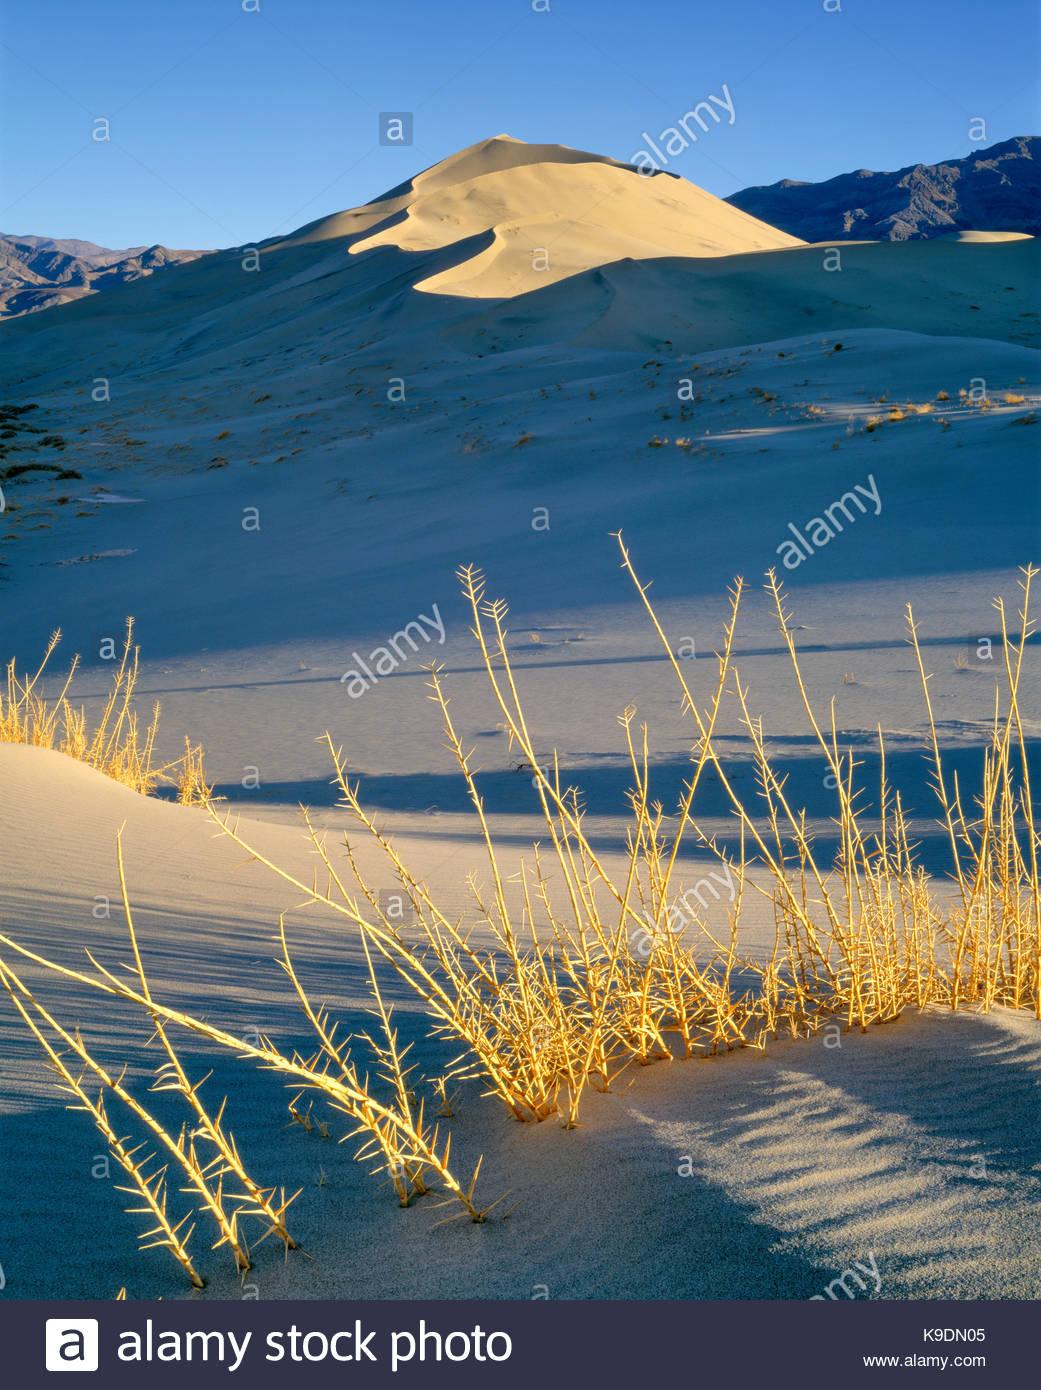 Eureka Dune Grass [endangered species] and Eureka Sand Dunes, Death Valley National Park, California - Stock Image